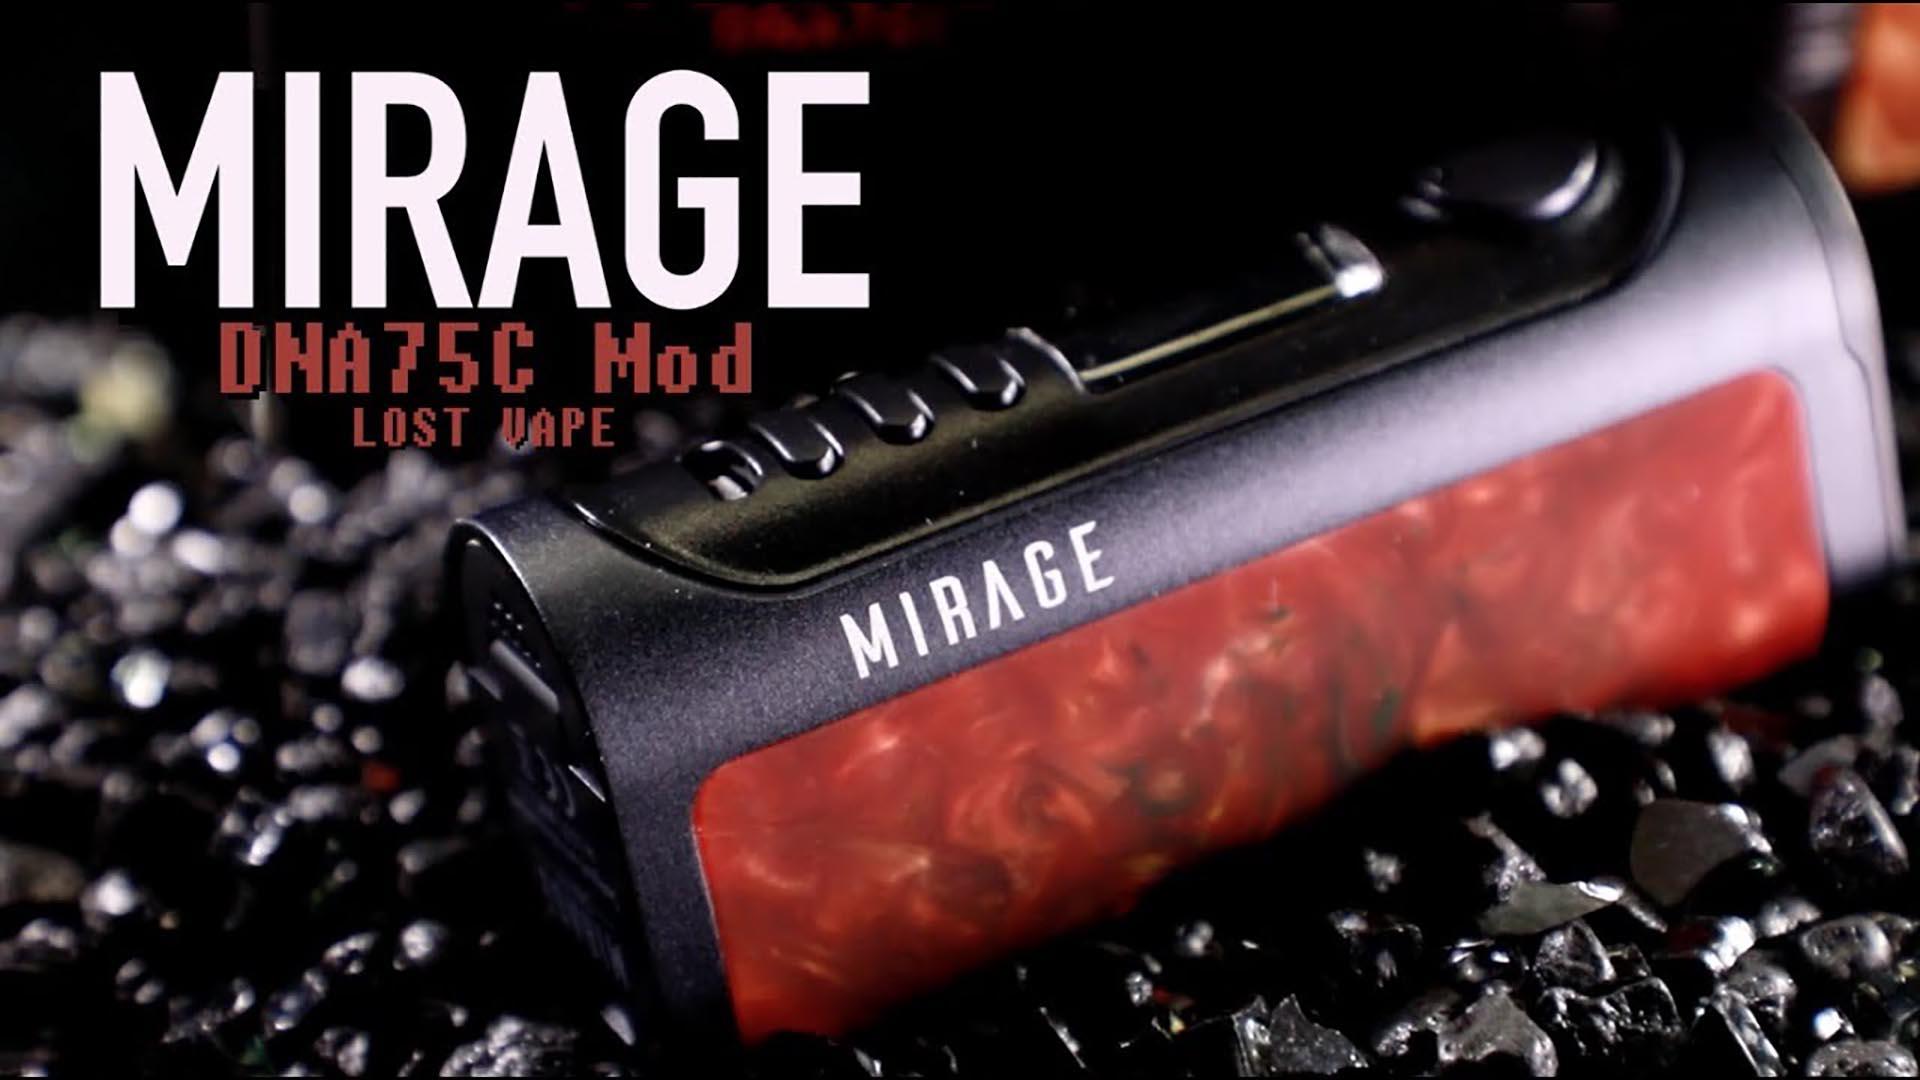 MIRAGE-DNA75C-LOST-VAPE